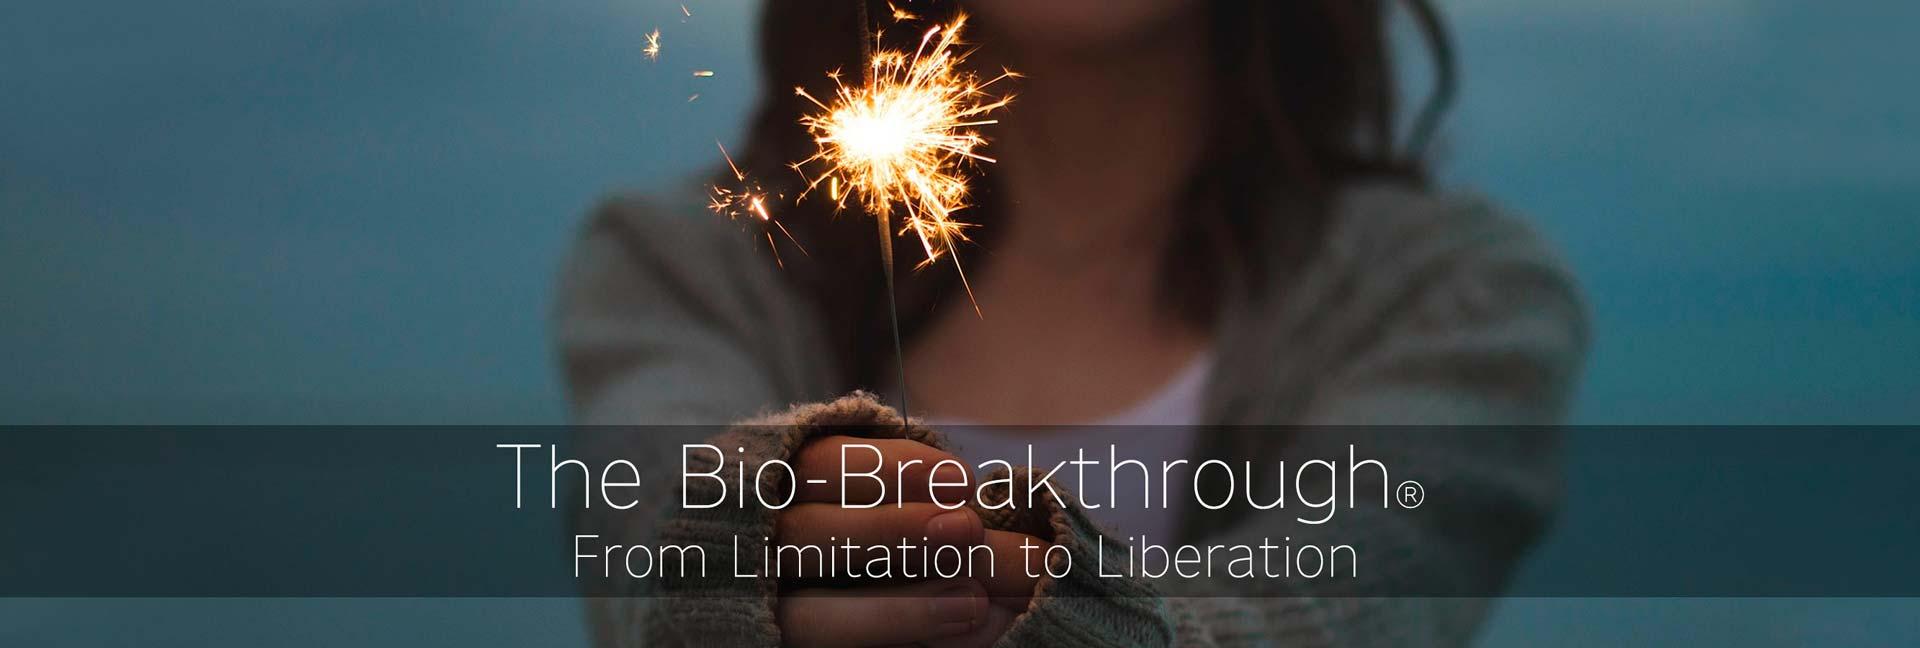 the Bio-Breakthrough